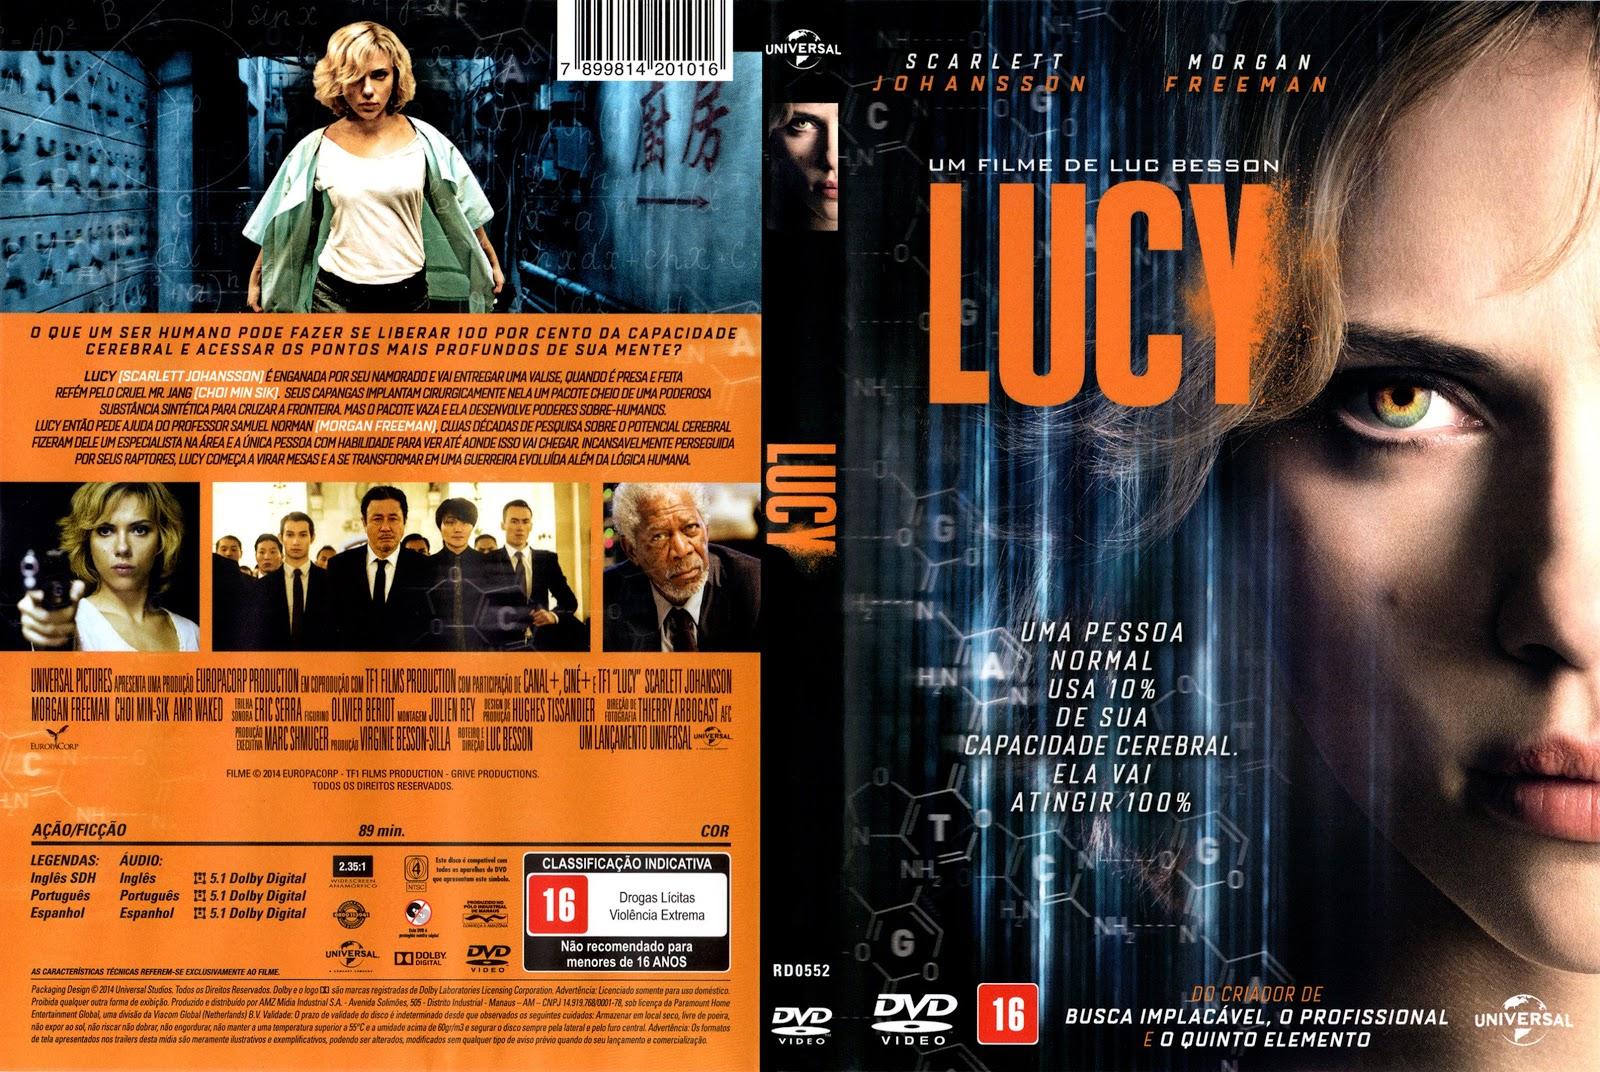 Capa DVD Lucy